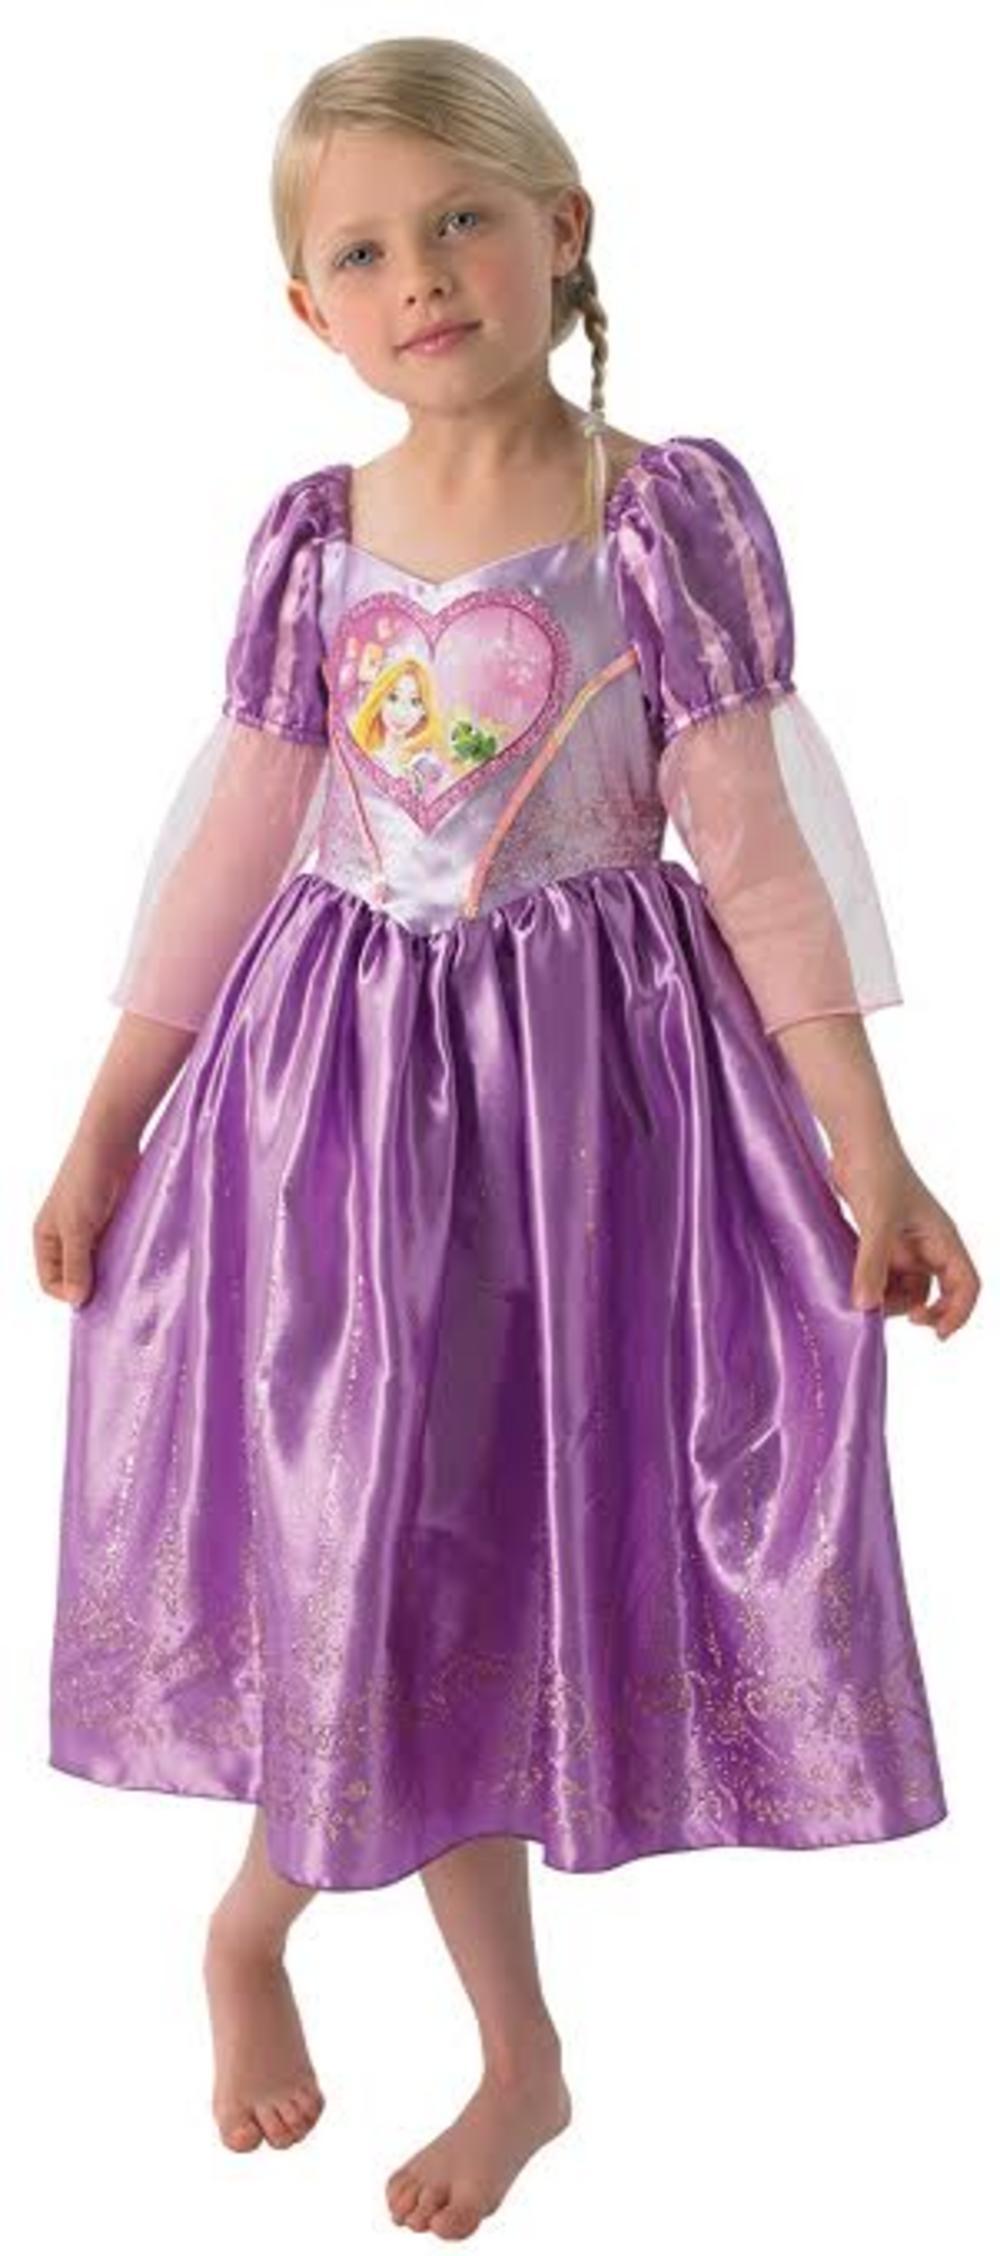 Loveheart Rapunzel Costume